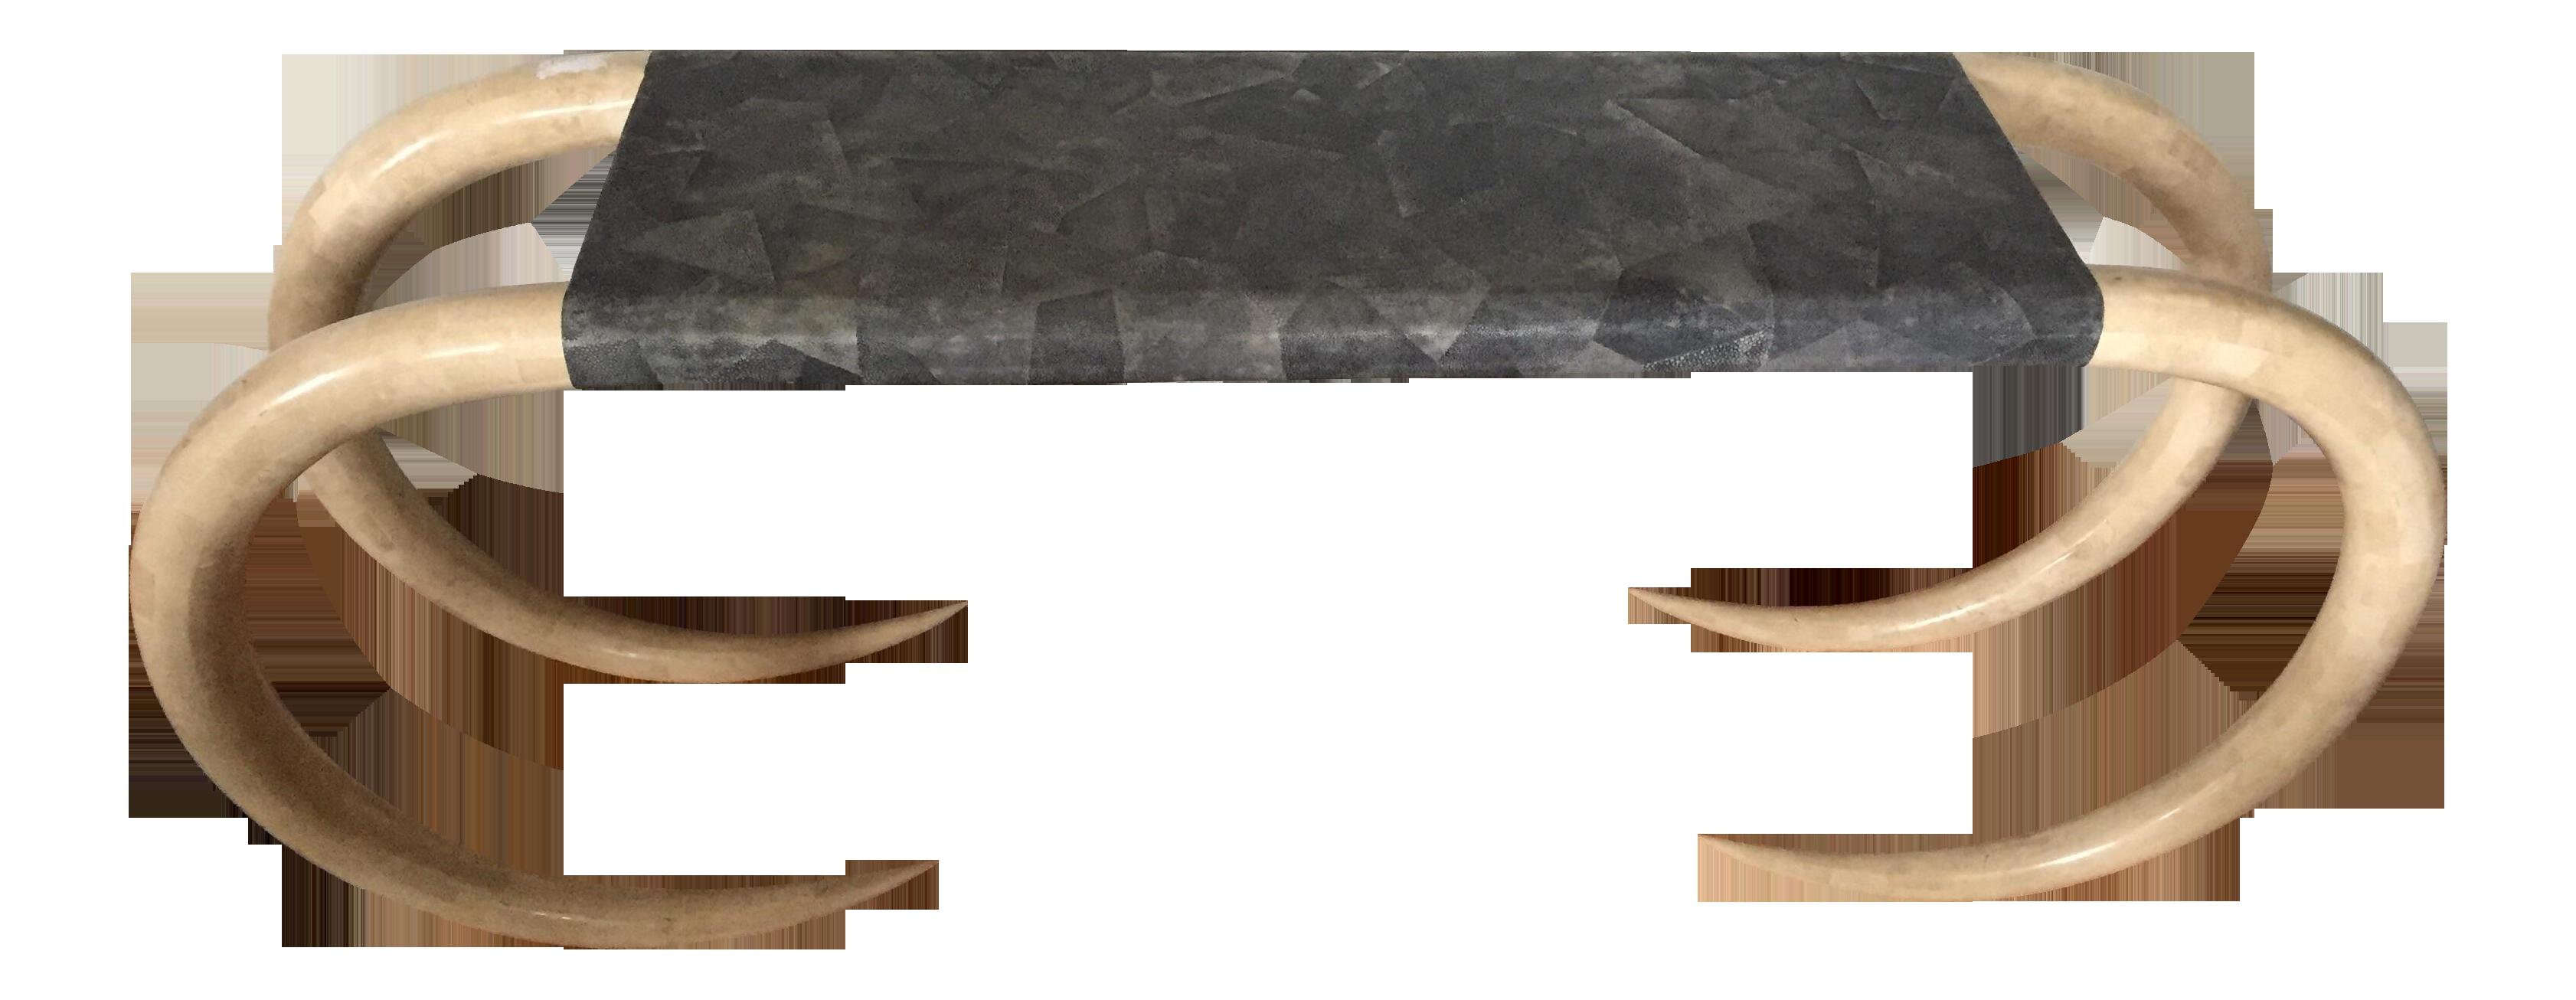 "Maitland Smith Tessellated Stone ""Tusk"" & Shagreen Console"